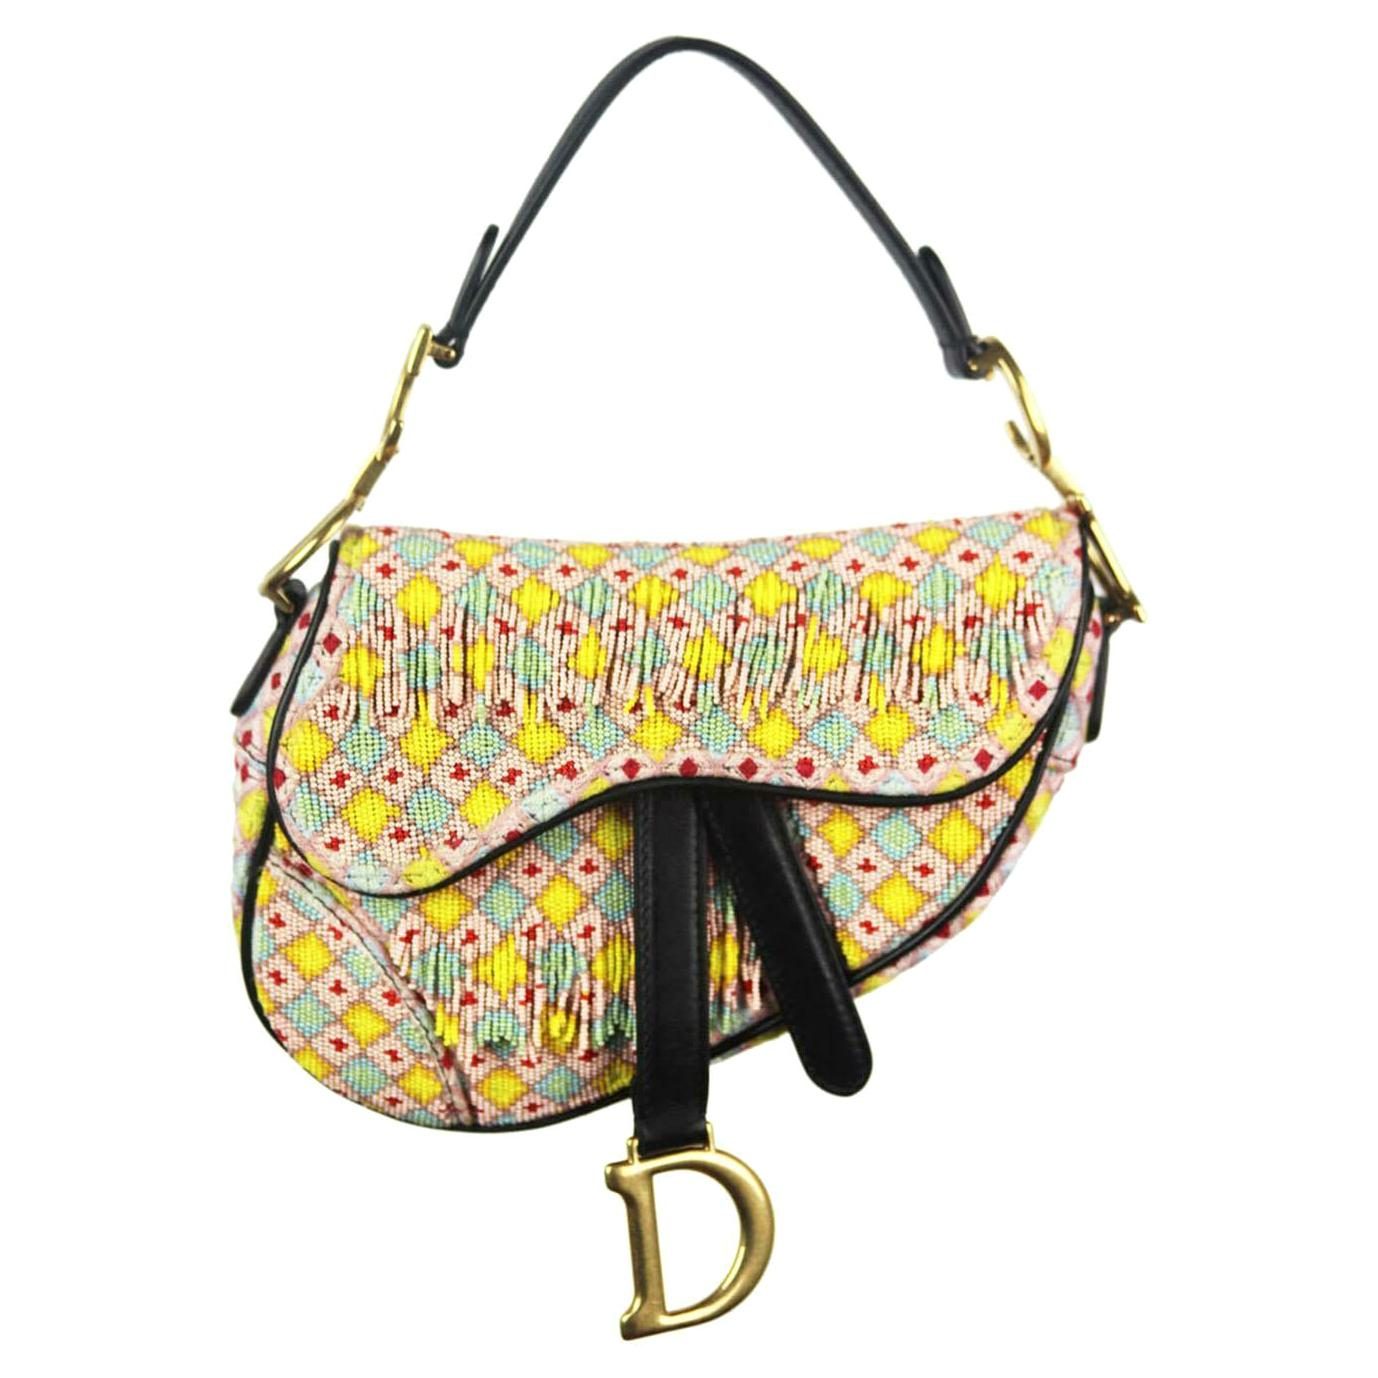 Christian Dior Mini Saddle Bead Embellished Leather Handbag